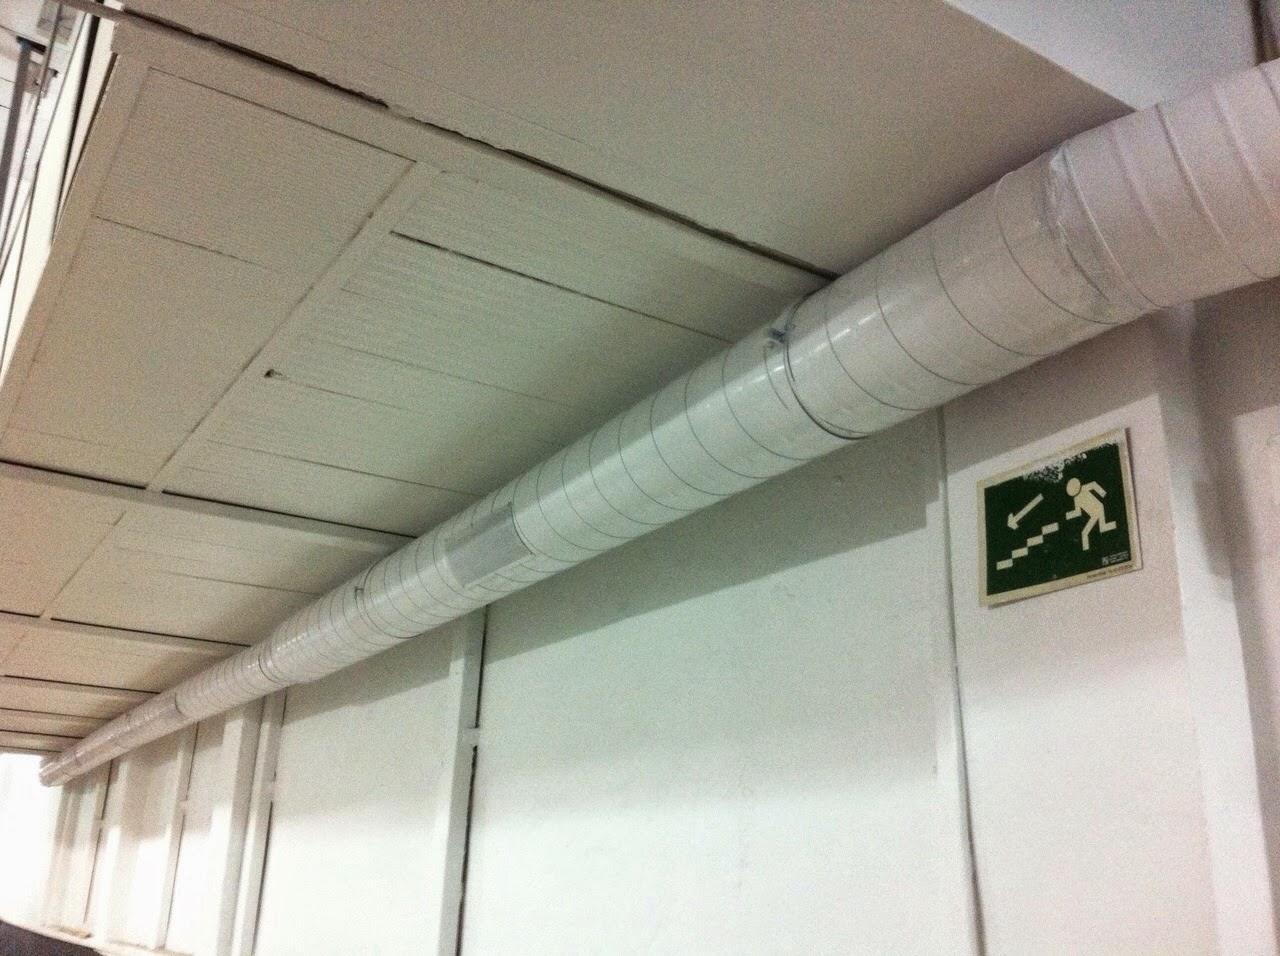 Tubos de chimenea madrid montadores tubos chimeneas - Detectores de monoxido de carbono ...